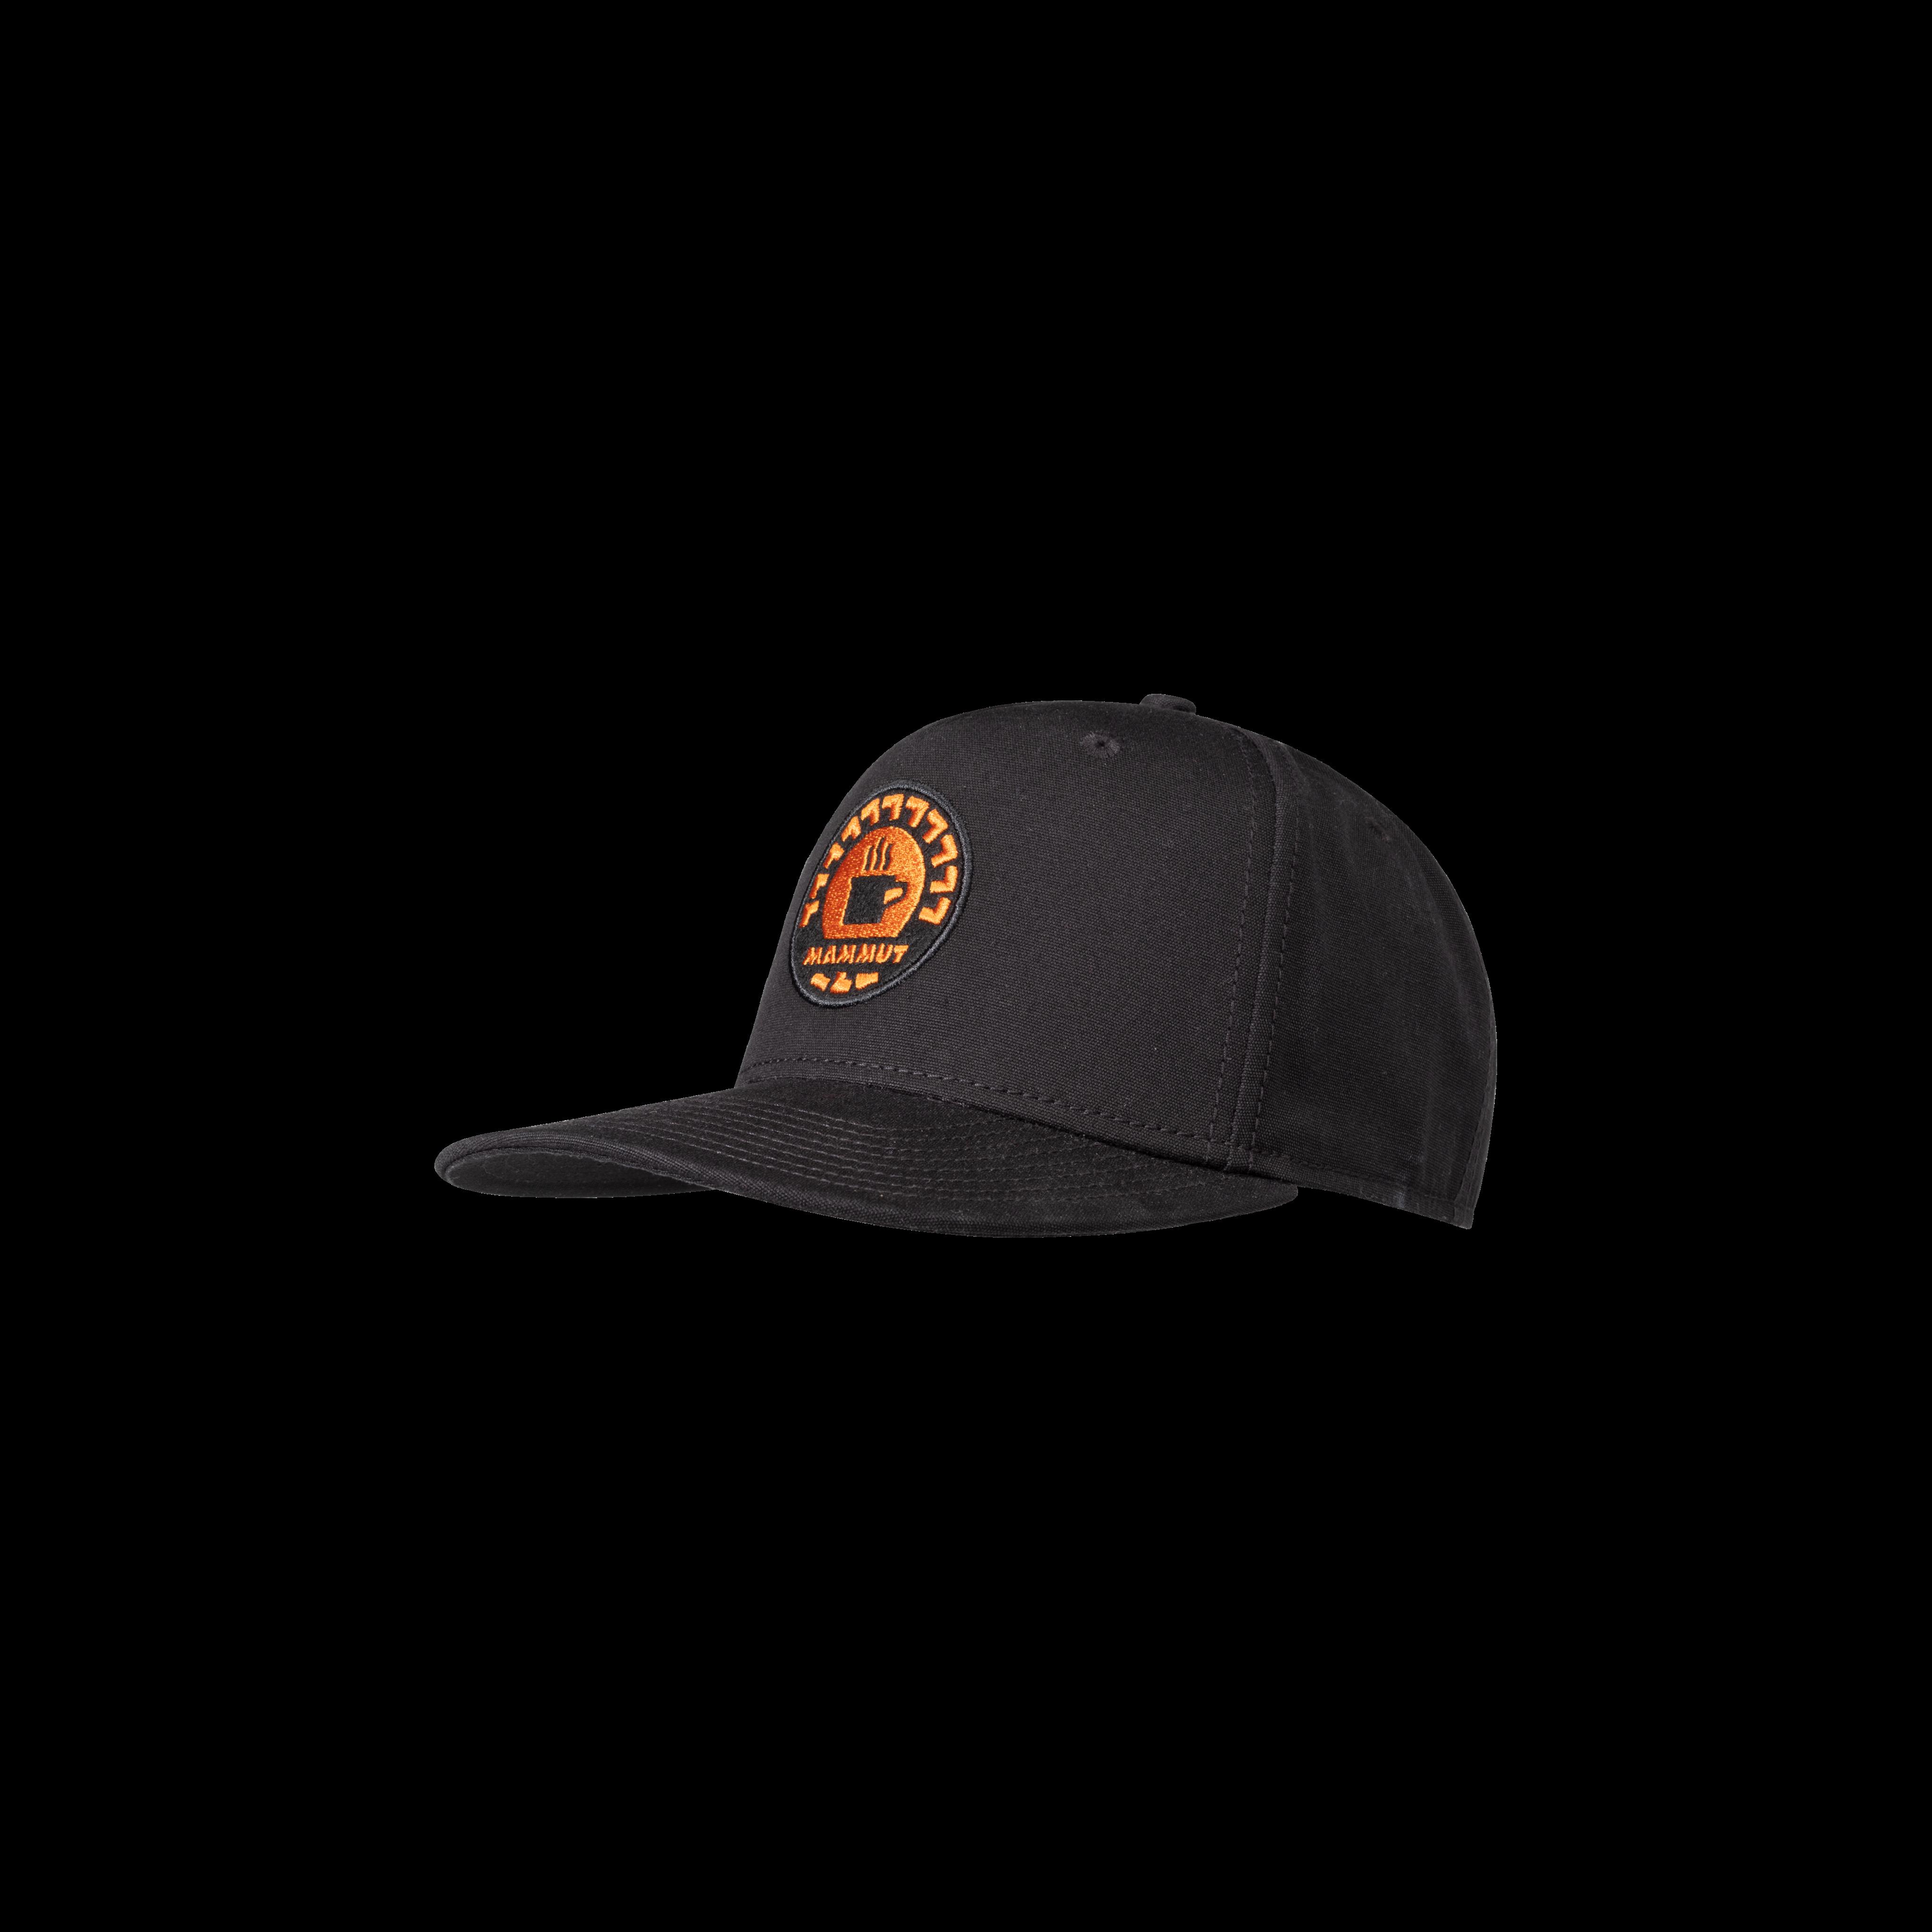 Massone Cap - black-dark cheddar, S-M thumbnail